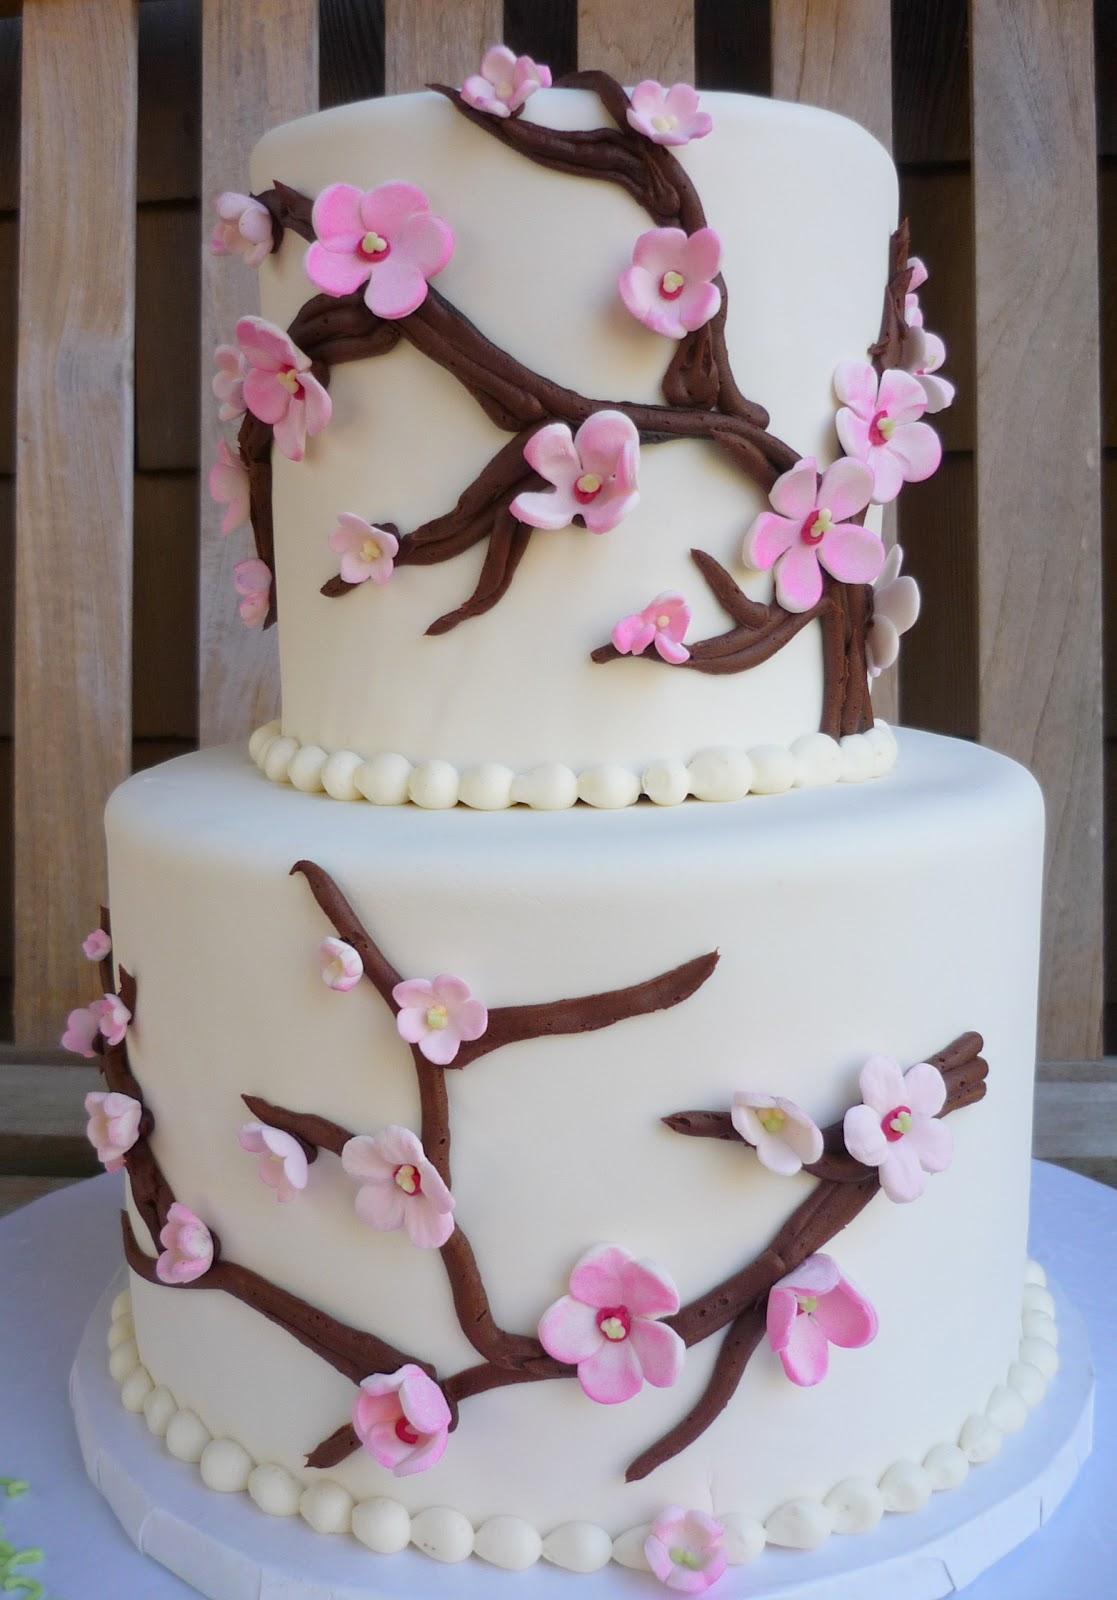 Colorful Wedding Cakes Cake Boss